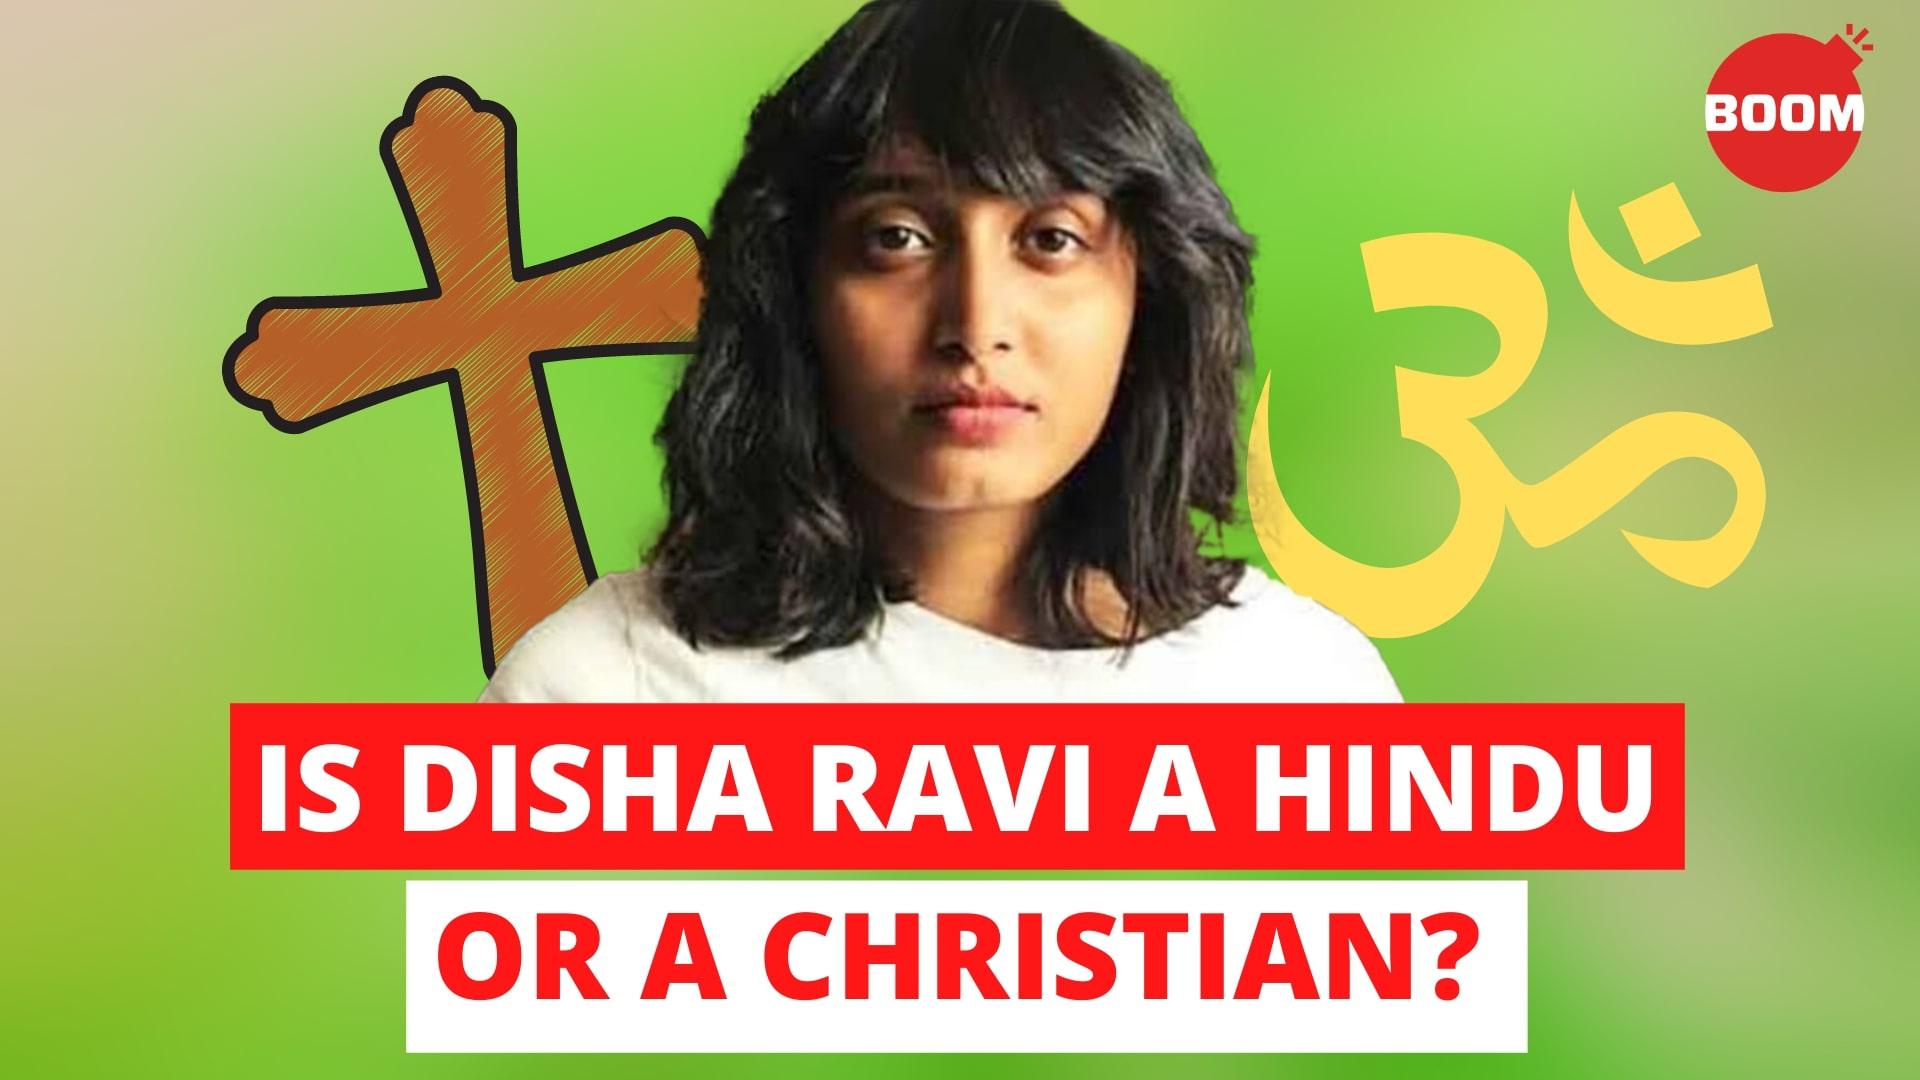 Is Disha Ravi A Hindu Or A Christian? | BOOM | Fridays For Future